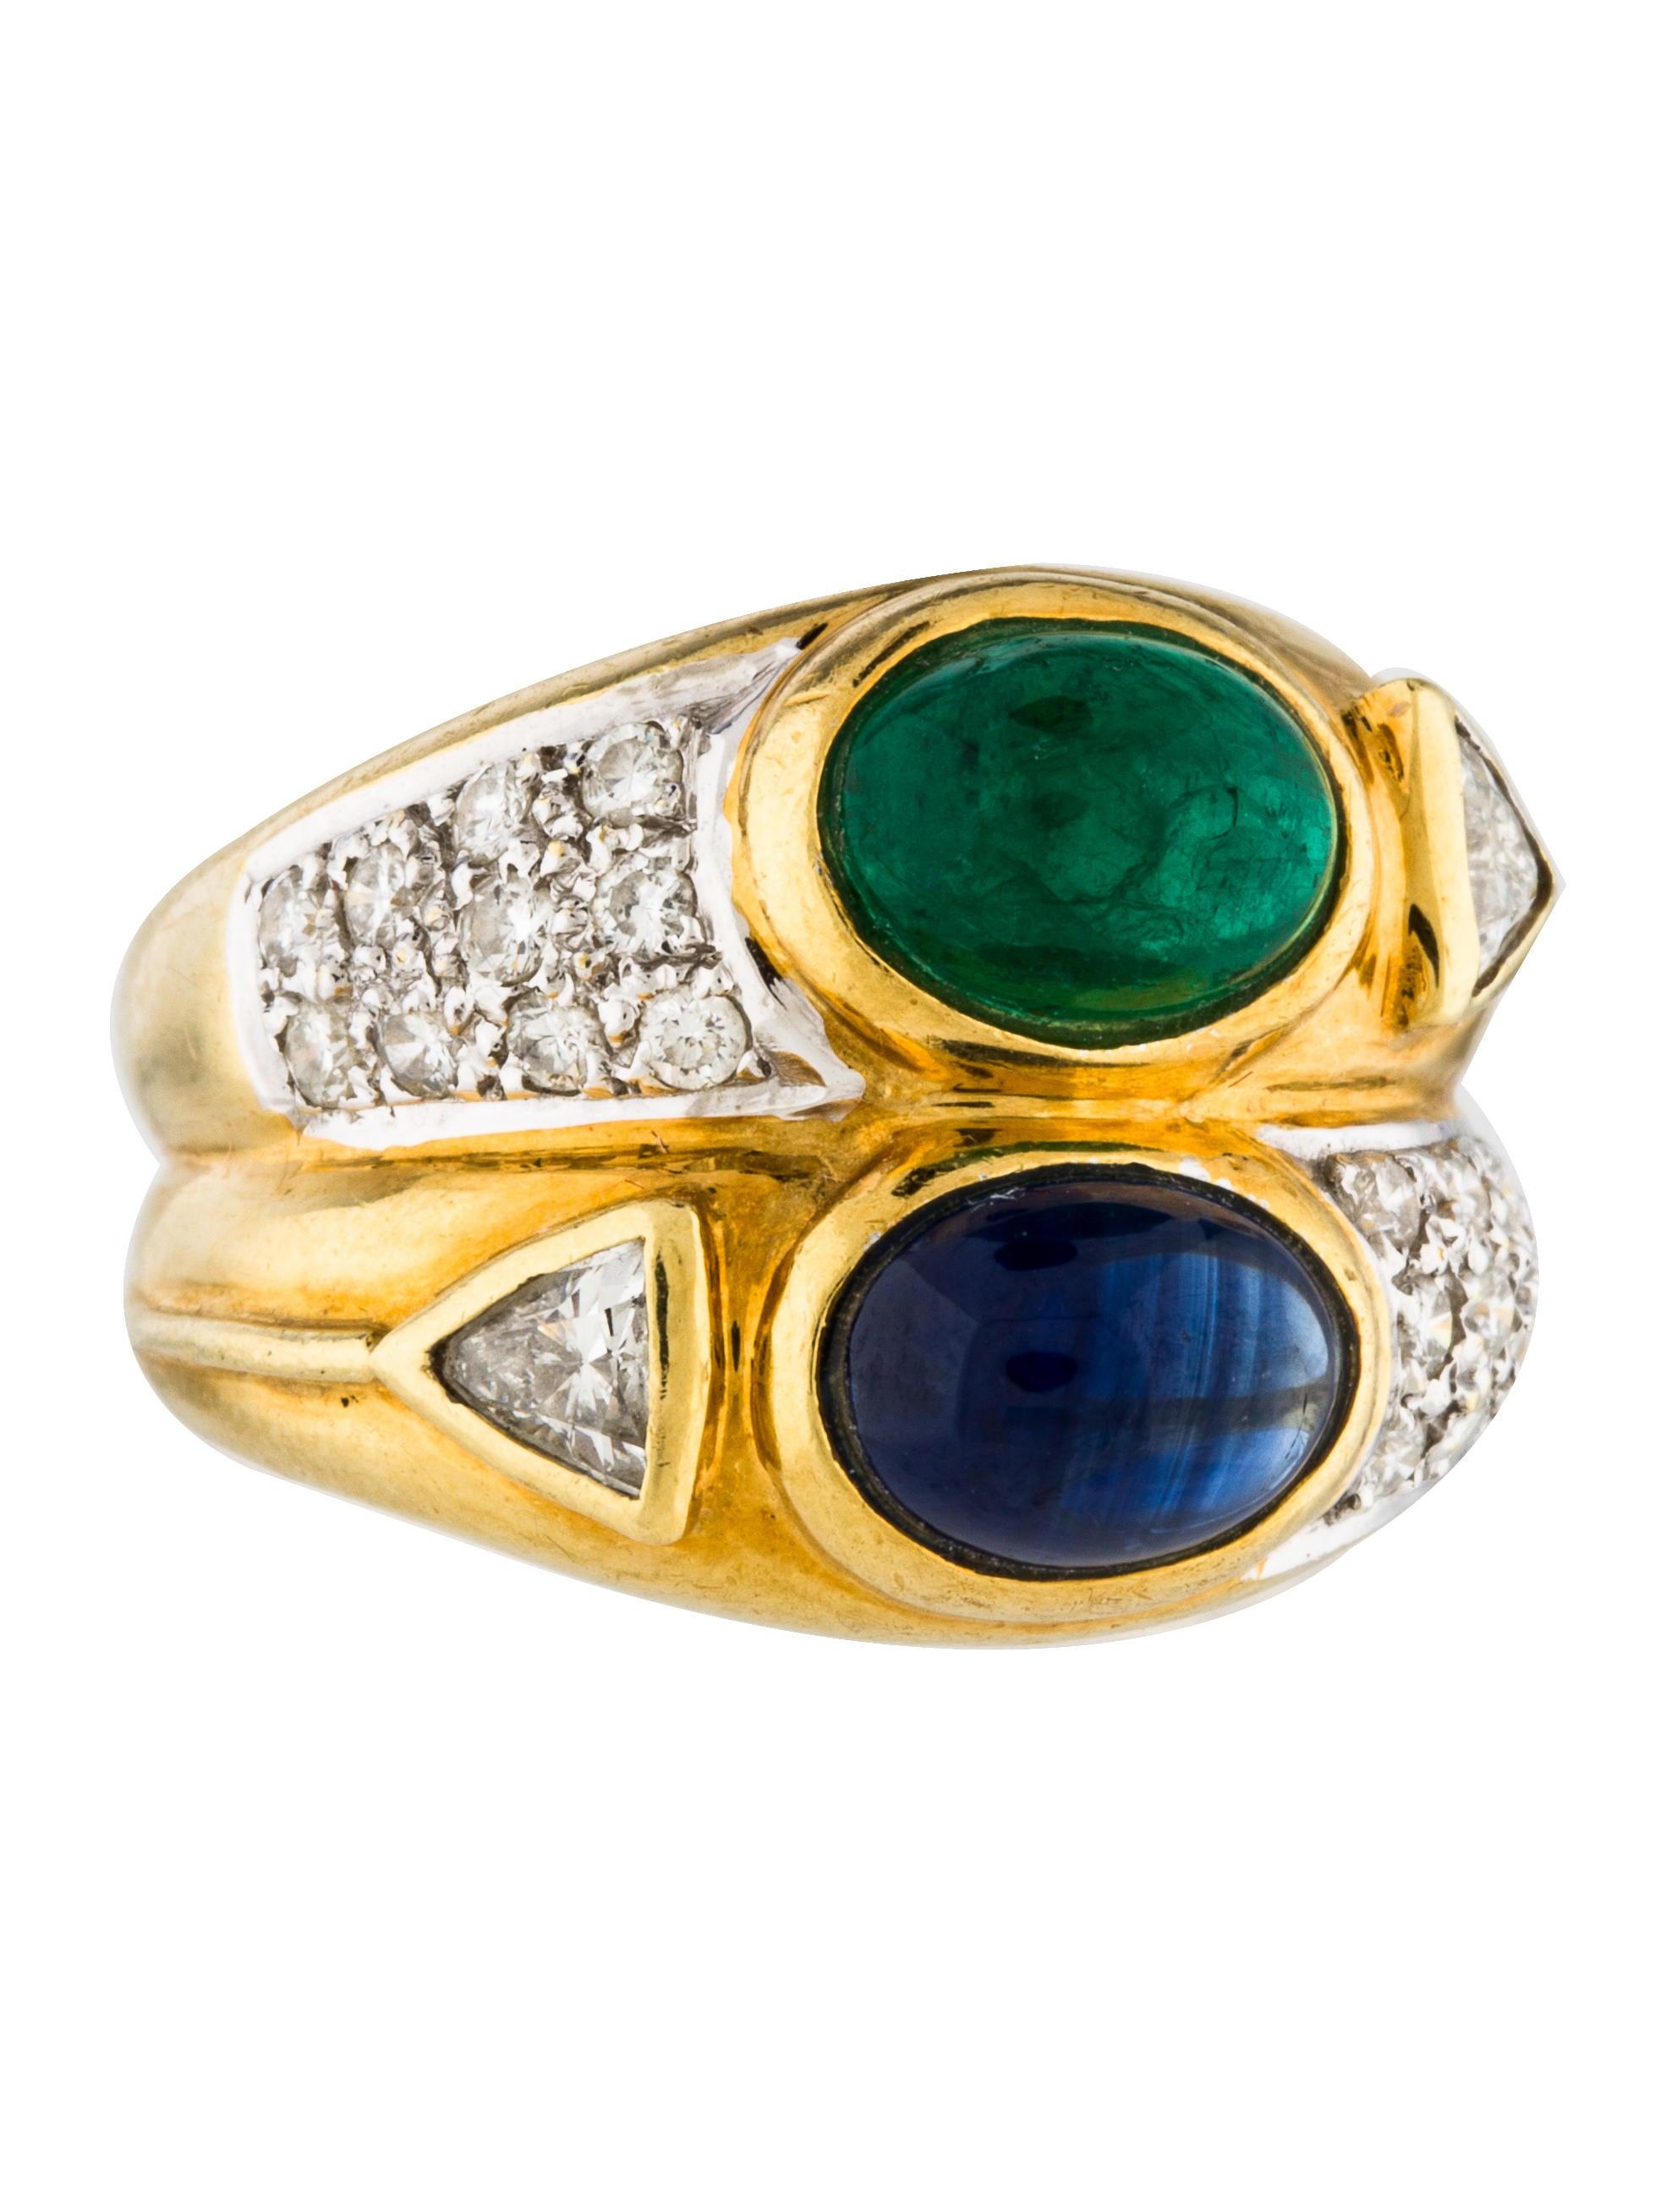 18k emerald sapphire diamond ring rings rring42248. Black Bedroom Furniture Sets. Home Design Ideas